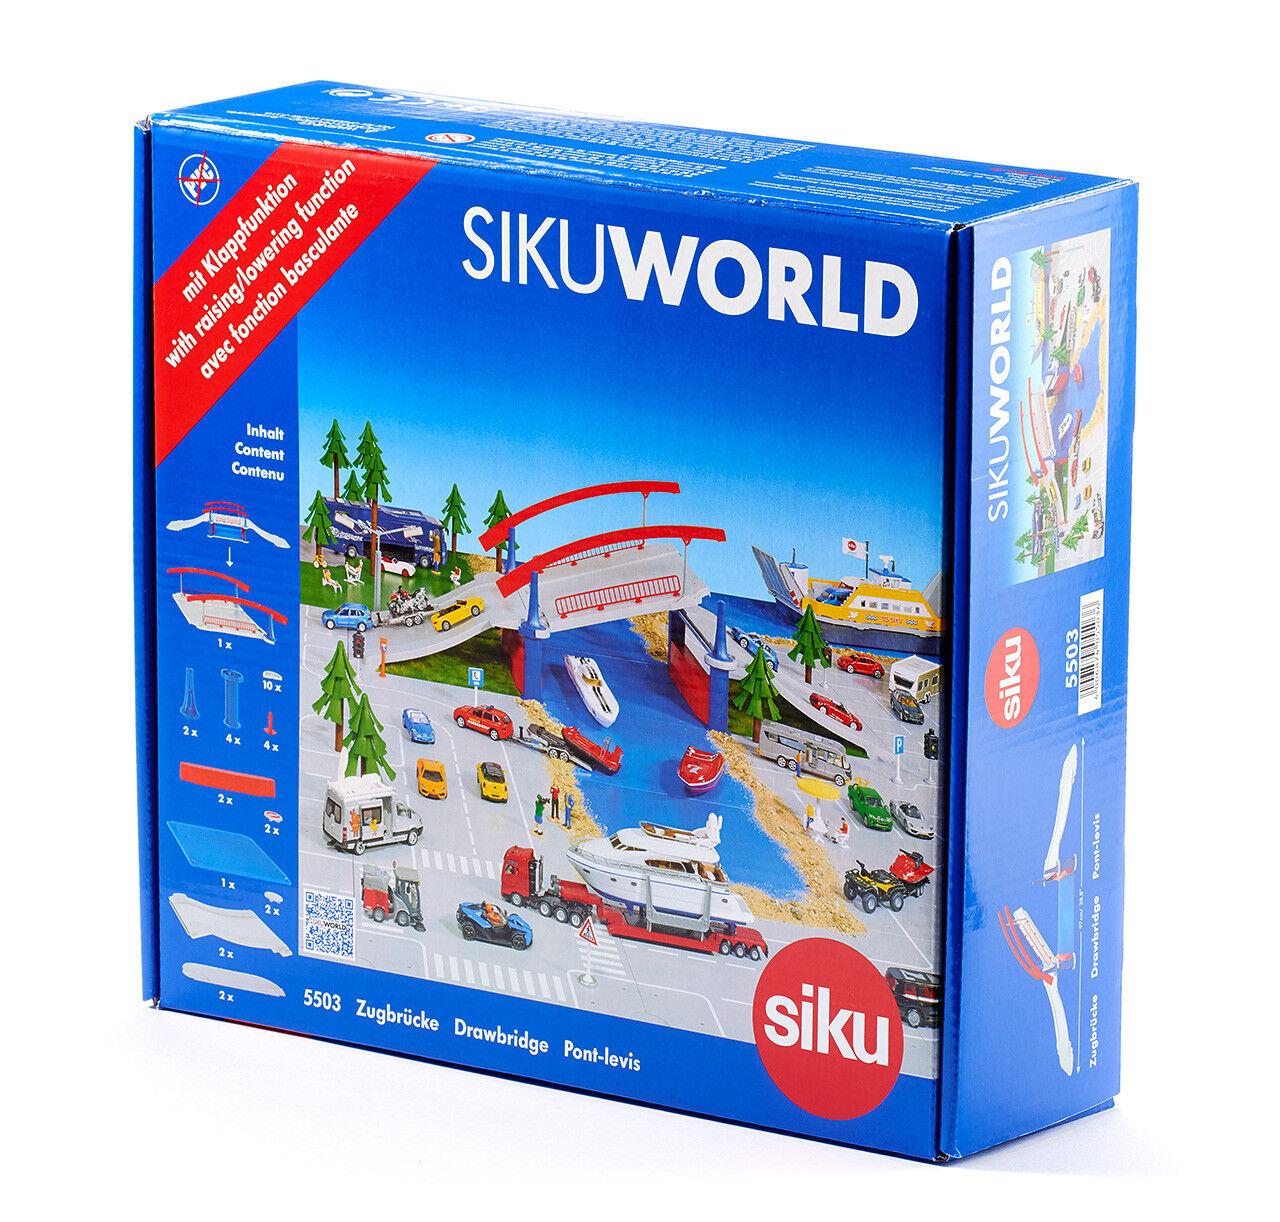 Siku World 5503 Zugbrücke  1:50  NEU in OVP